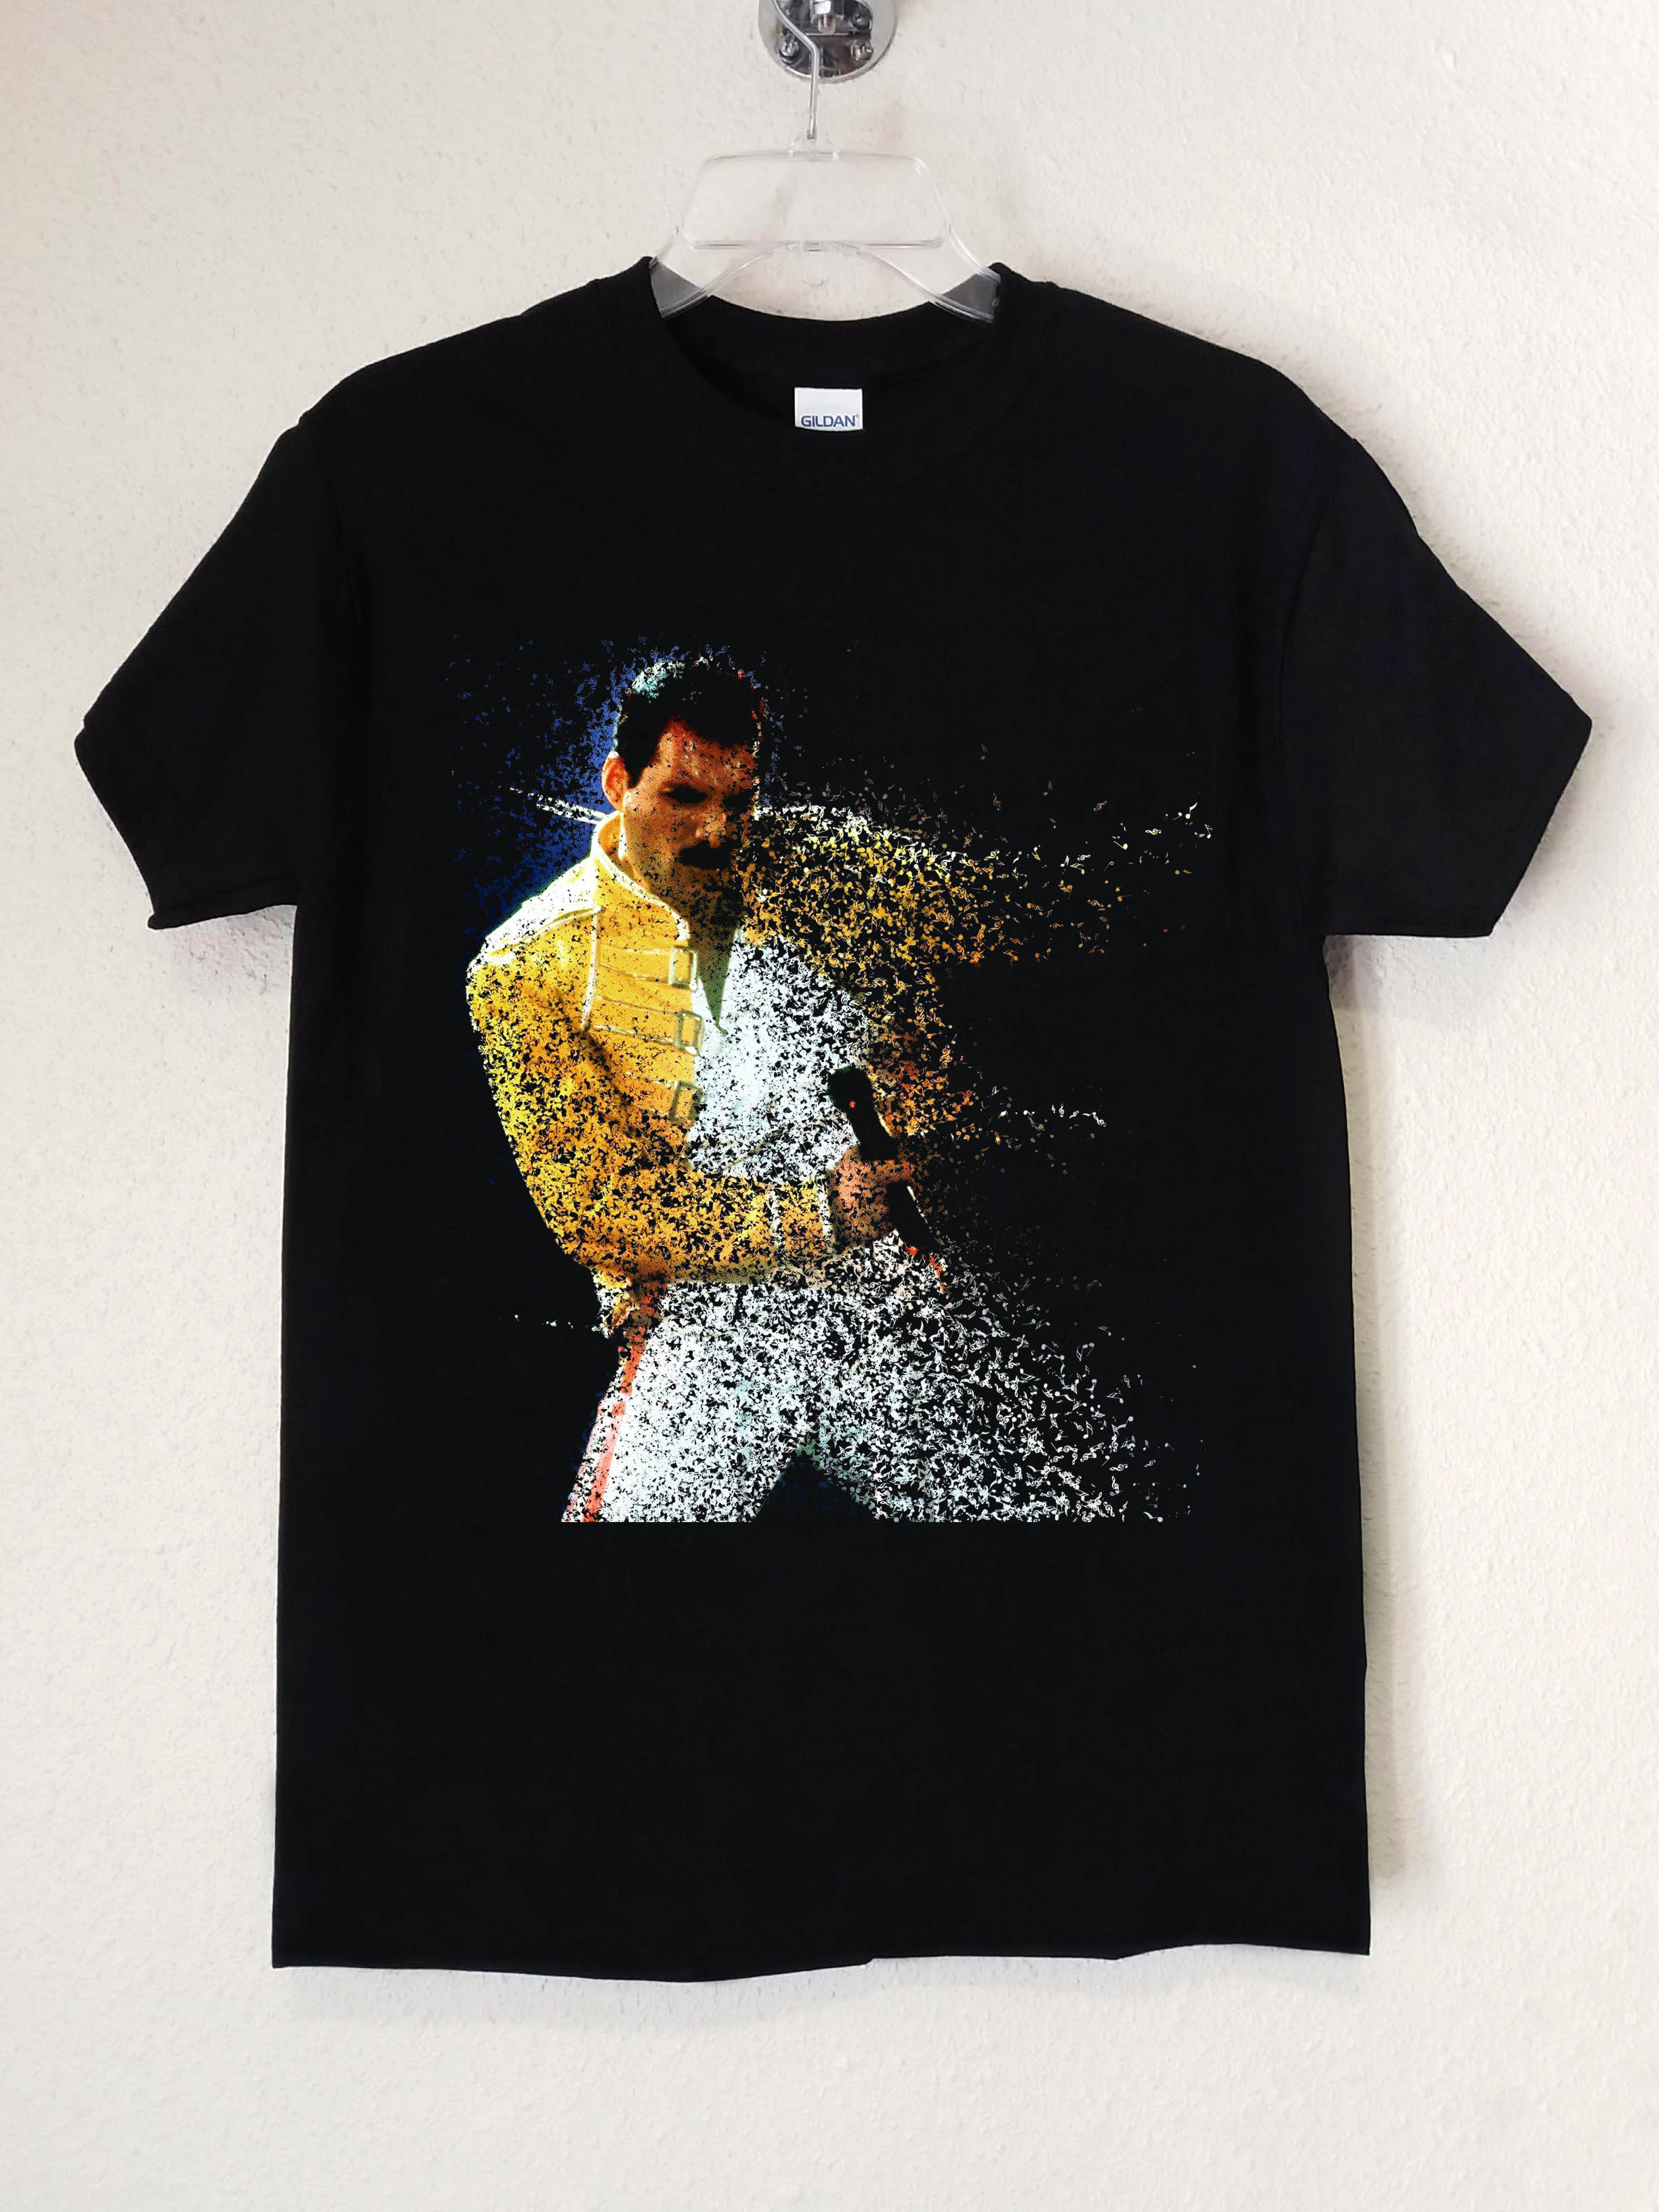 ae1fd68d62ff5 Queen Freddie Mercury Fade Out Polera Negra Hombre - Abominatron